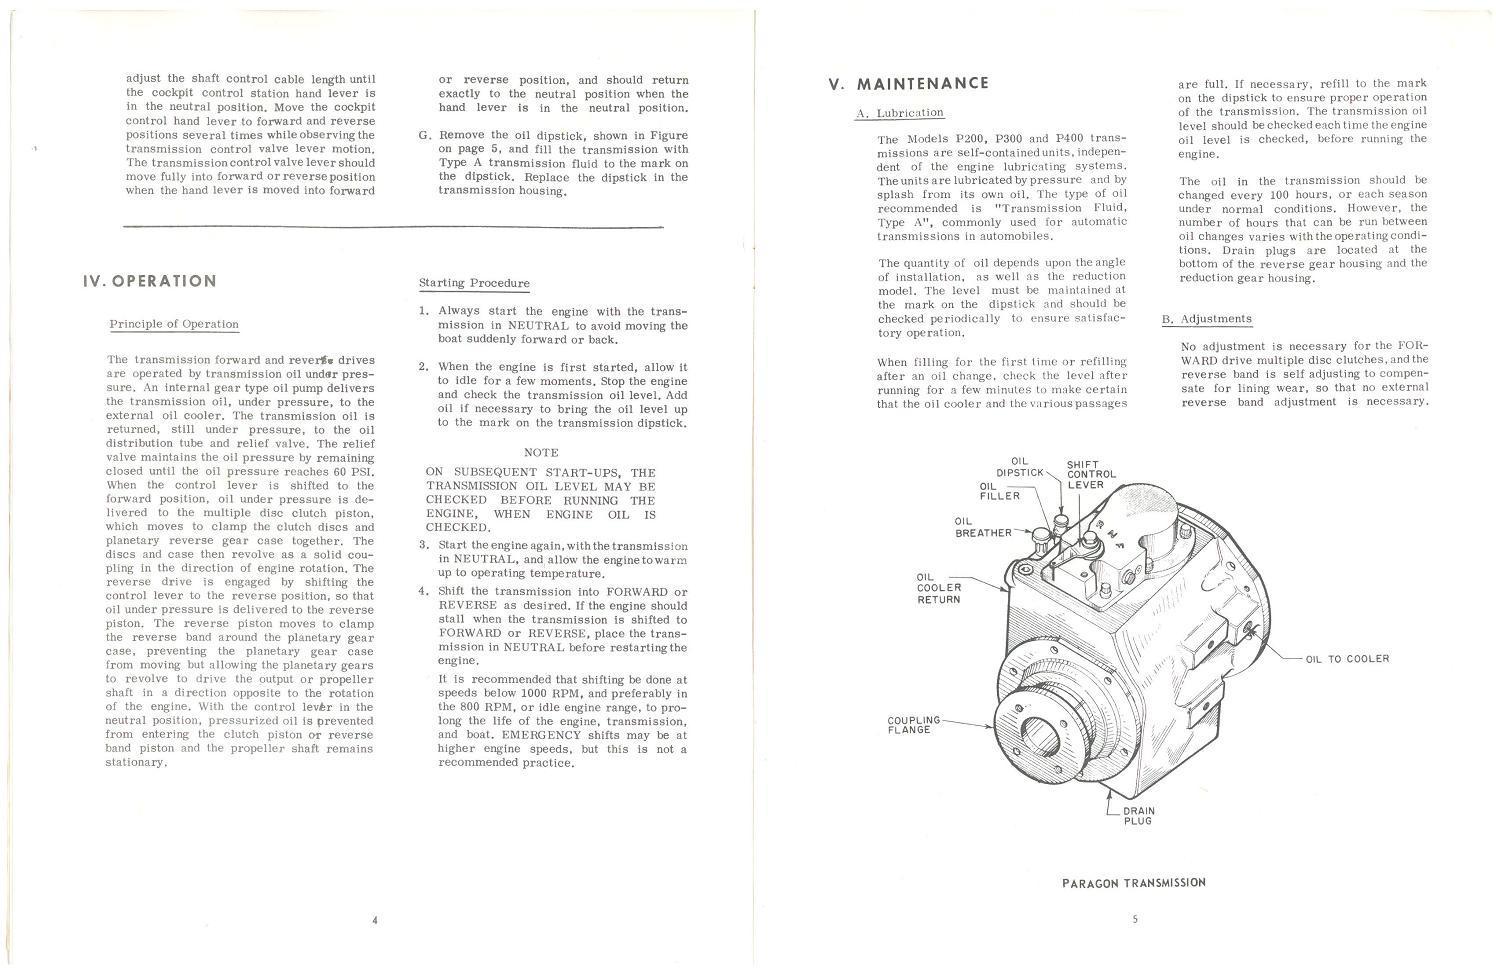 Chris Craft Commander Forum: Paragon Hydraulic